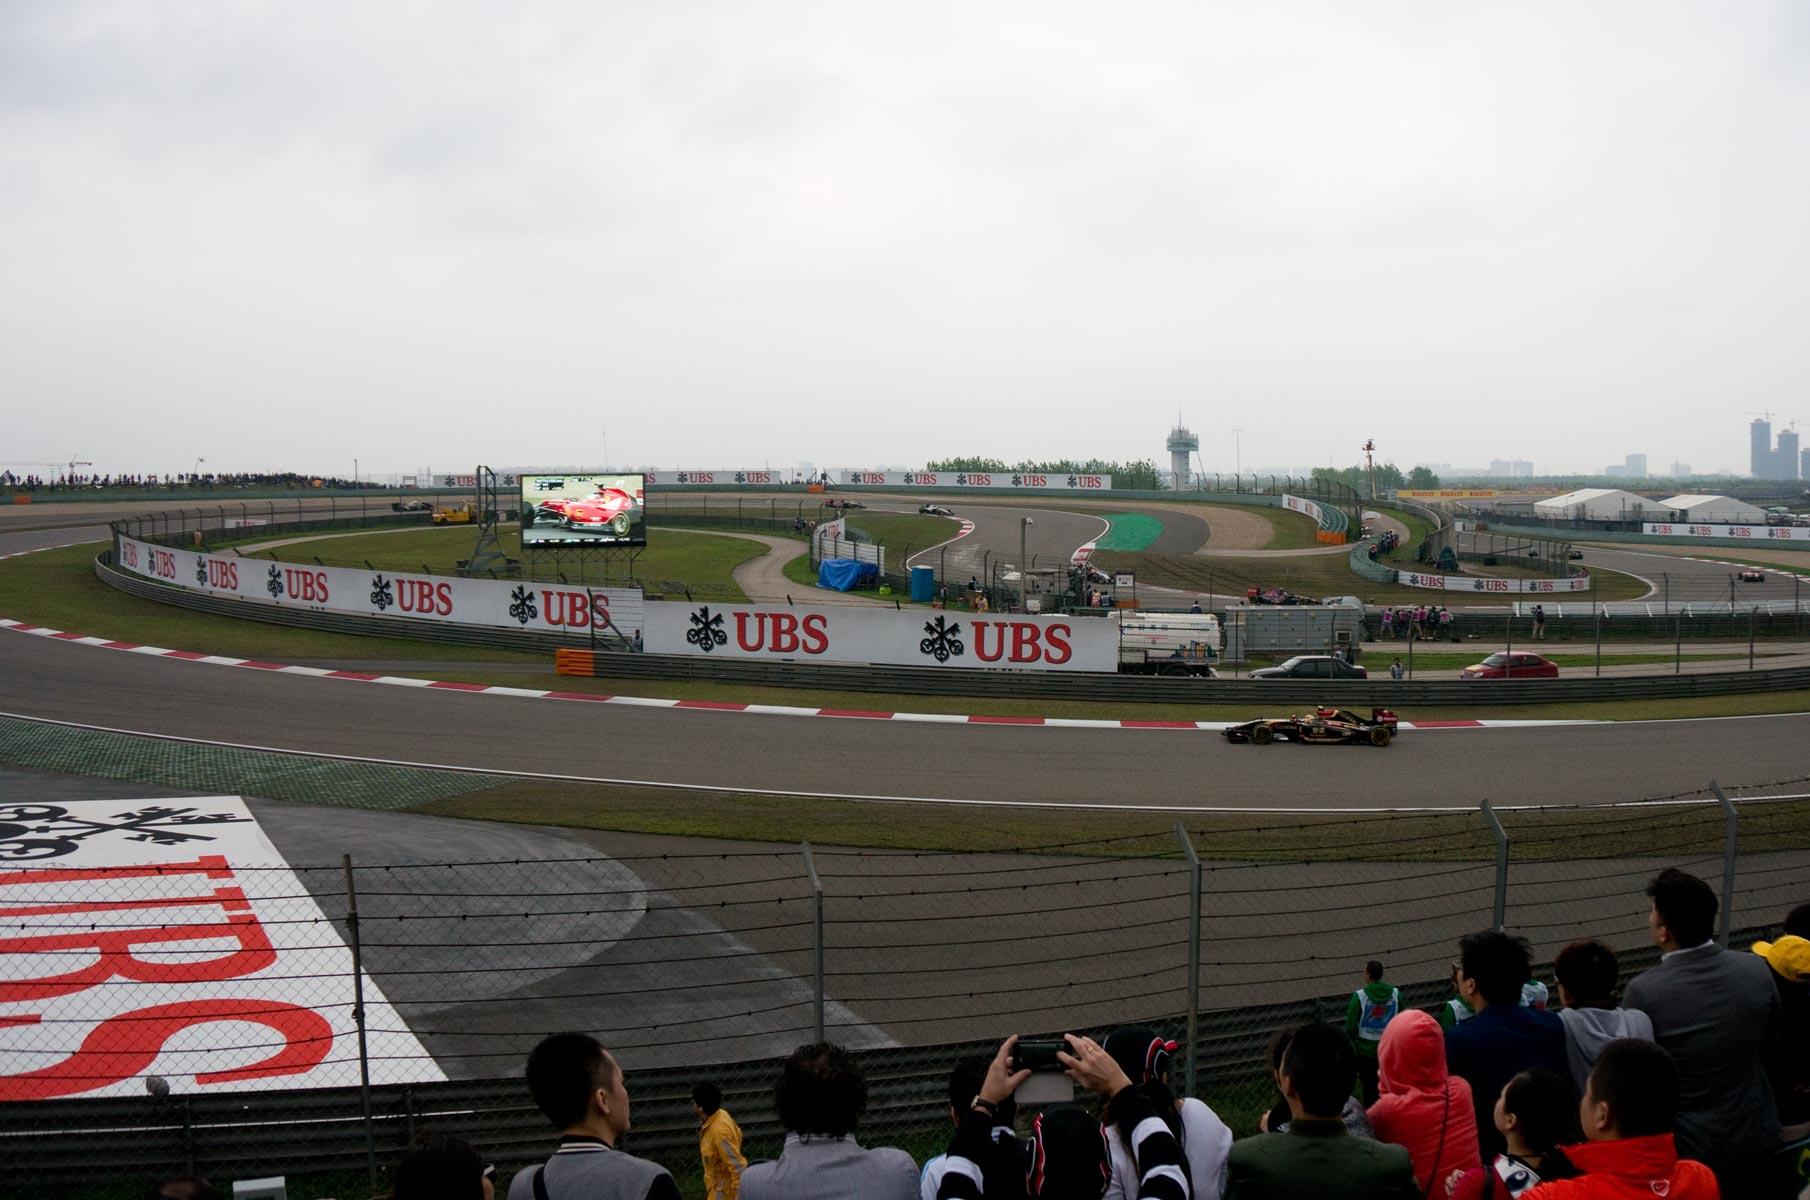 Formula 1 Grand Prix China 2014